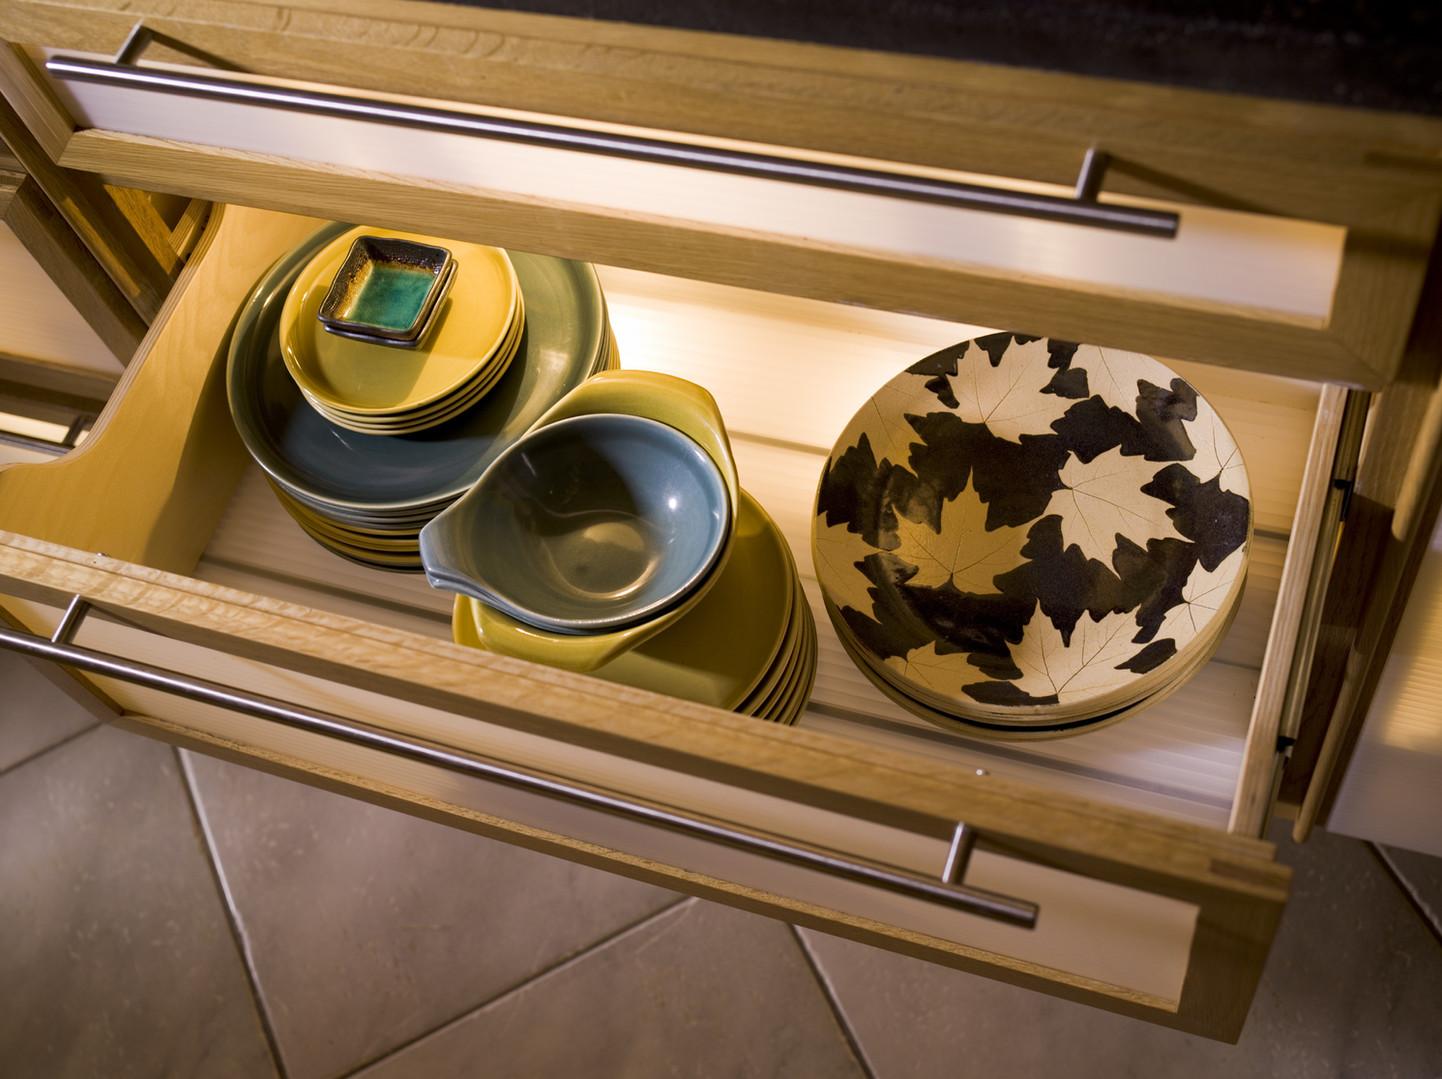 Danko Kitchen_inside drawers